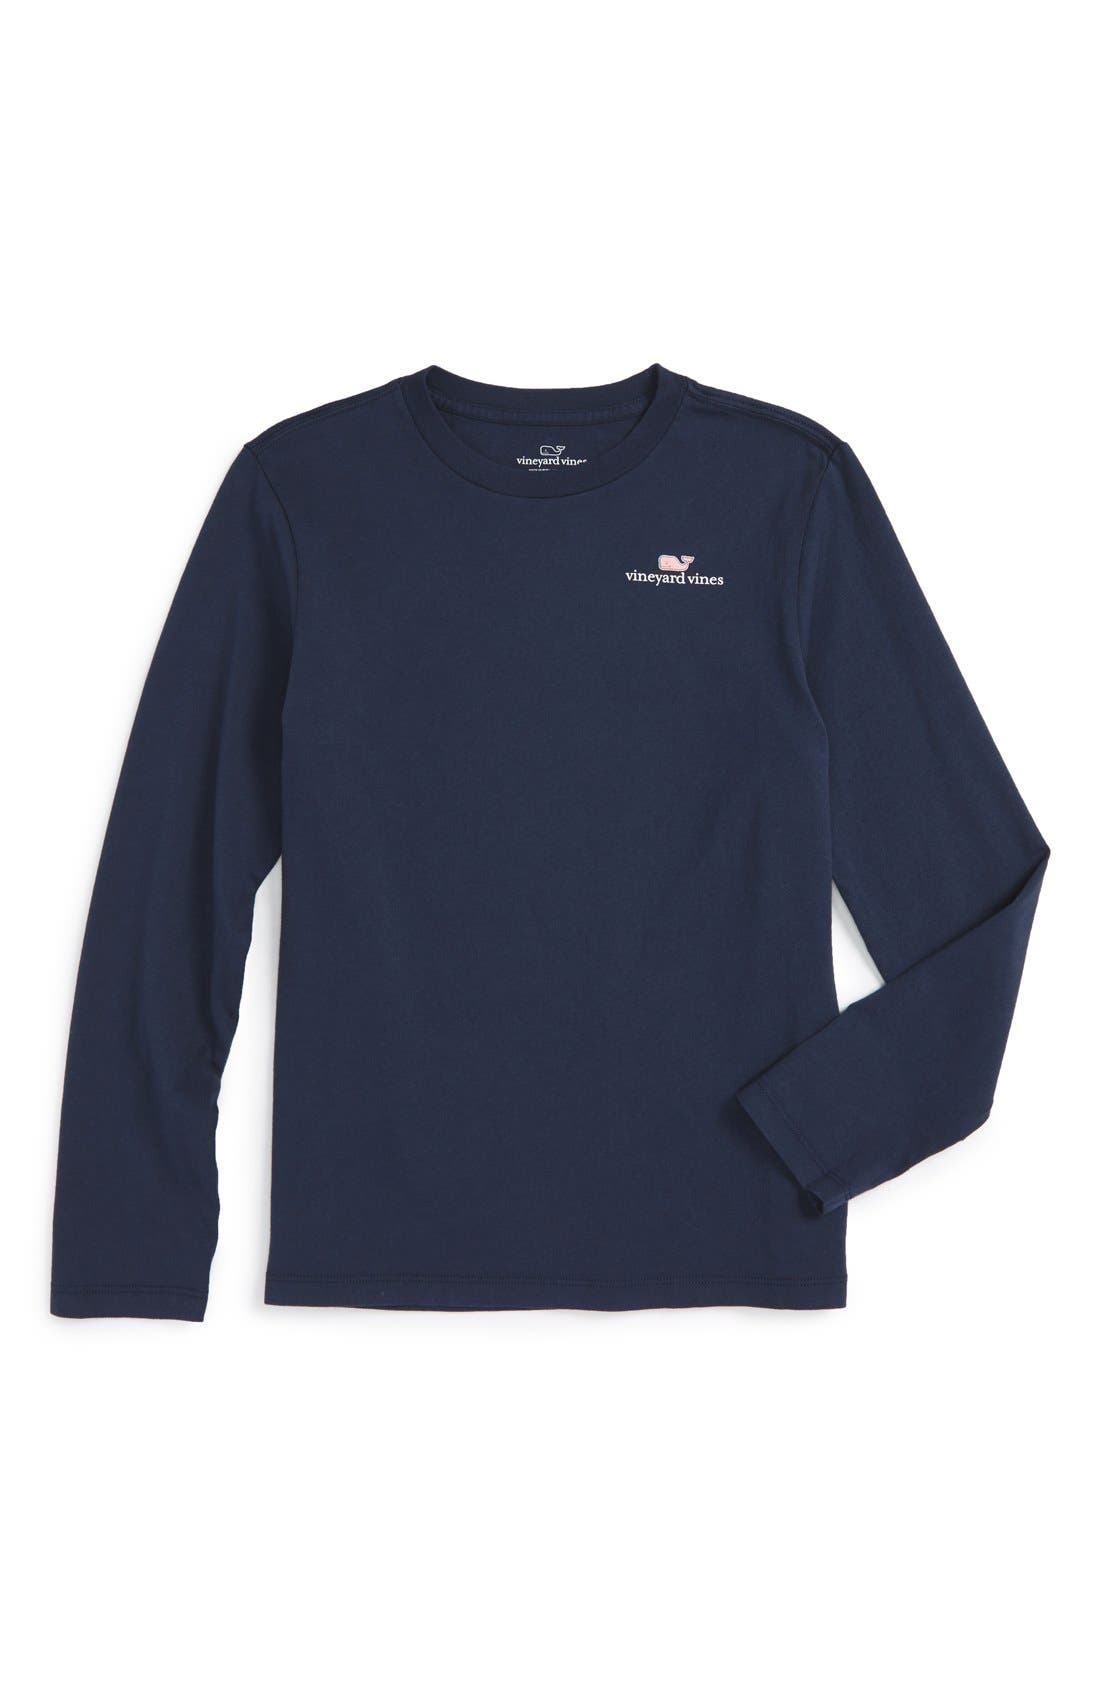 Main Image - Vineyard Vines Logo Graphic Long Sleeve T-Shirt (Big Boys)